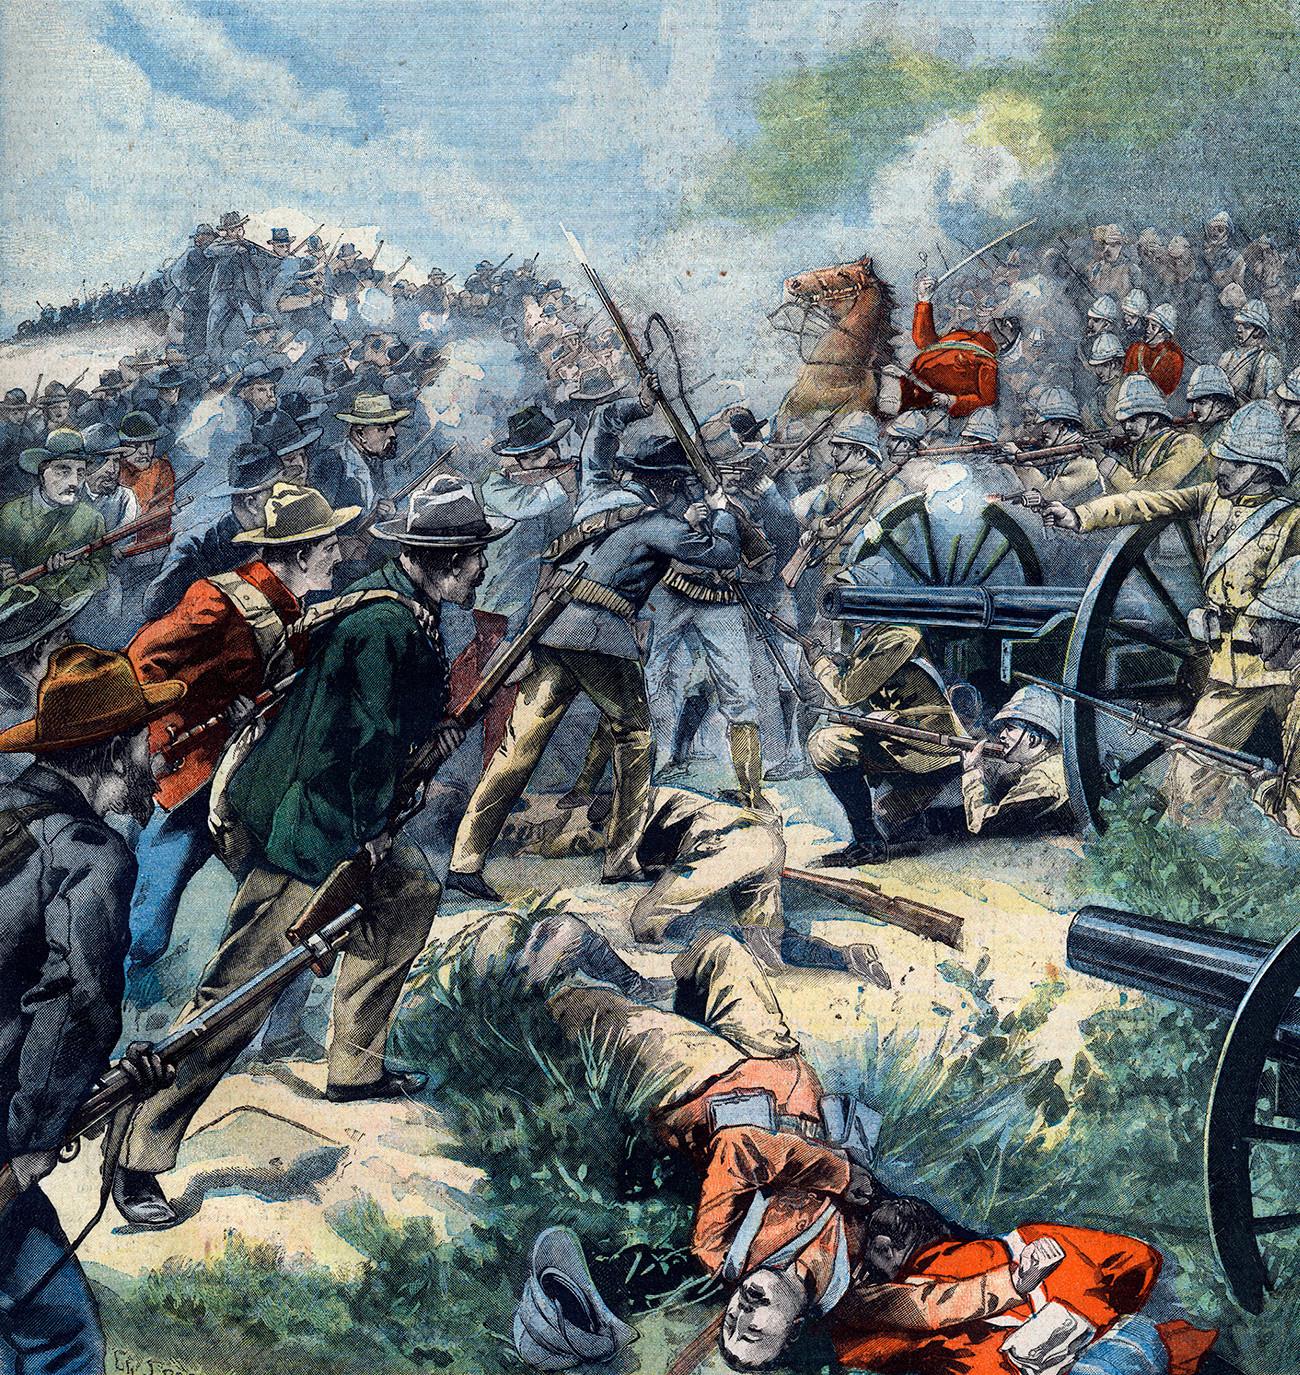 Drugi burski rat u Transvaalu, poraz Engleza u Berkelaktu. Naslovna stranica francuskog lista Le Petit Parisien, 17. studenog 1901.